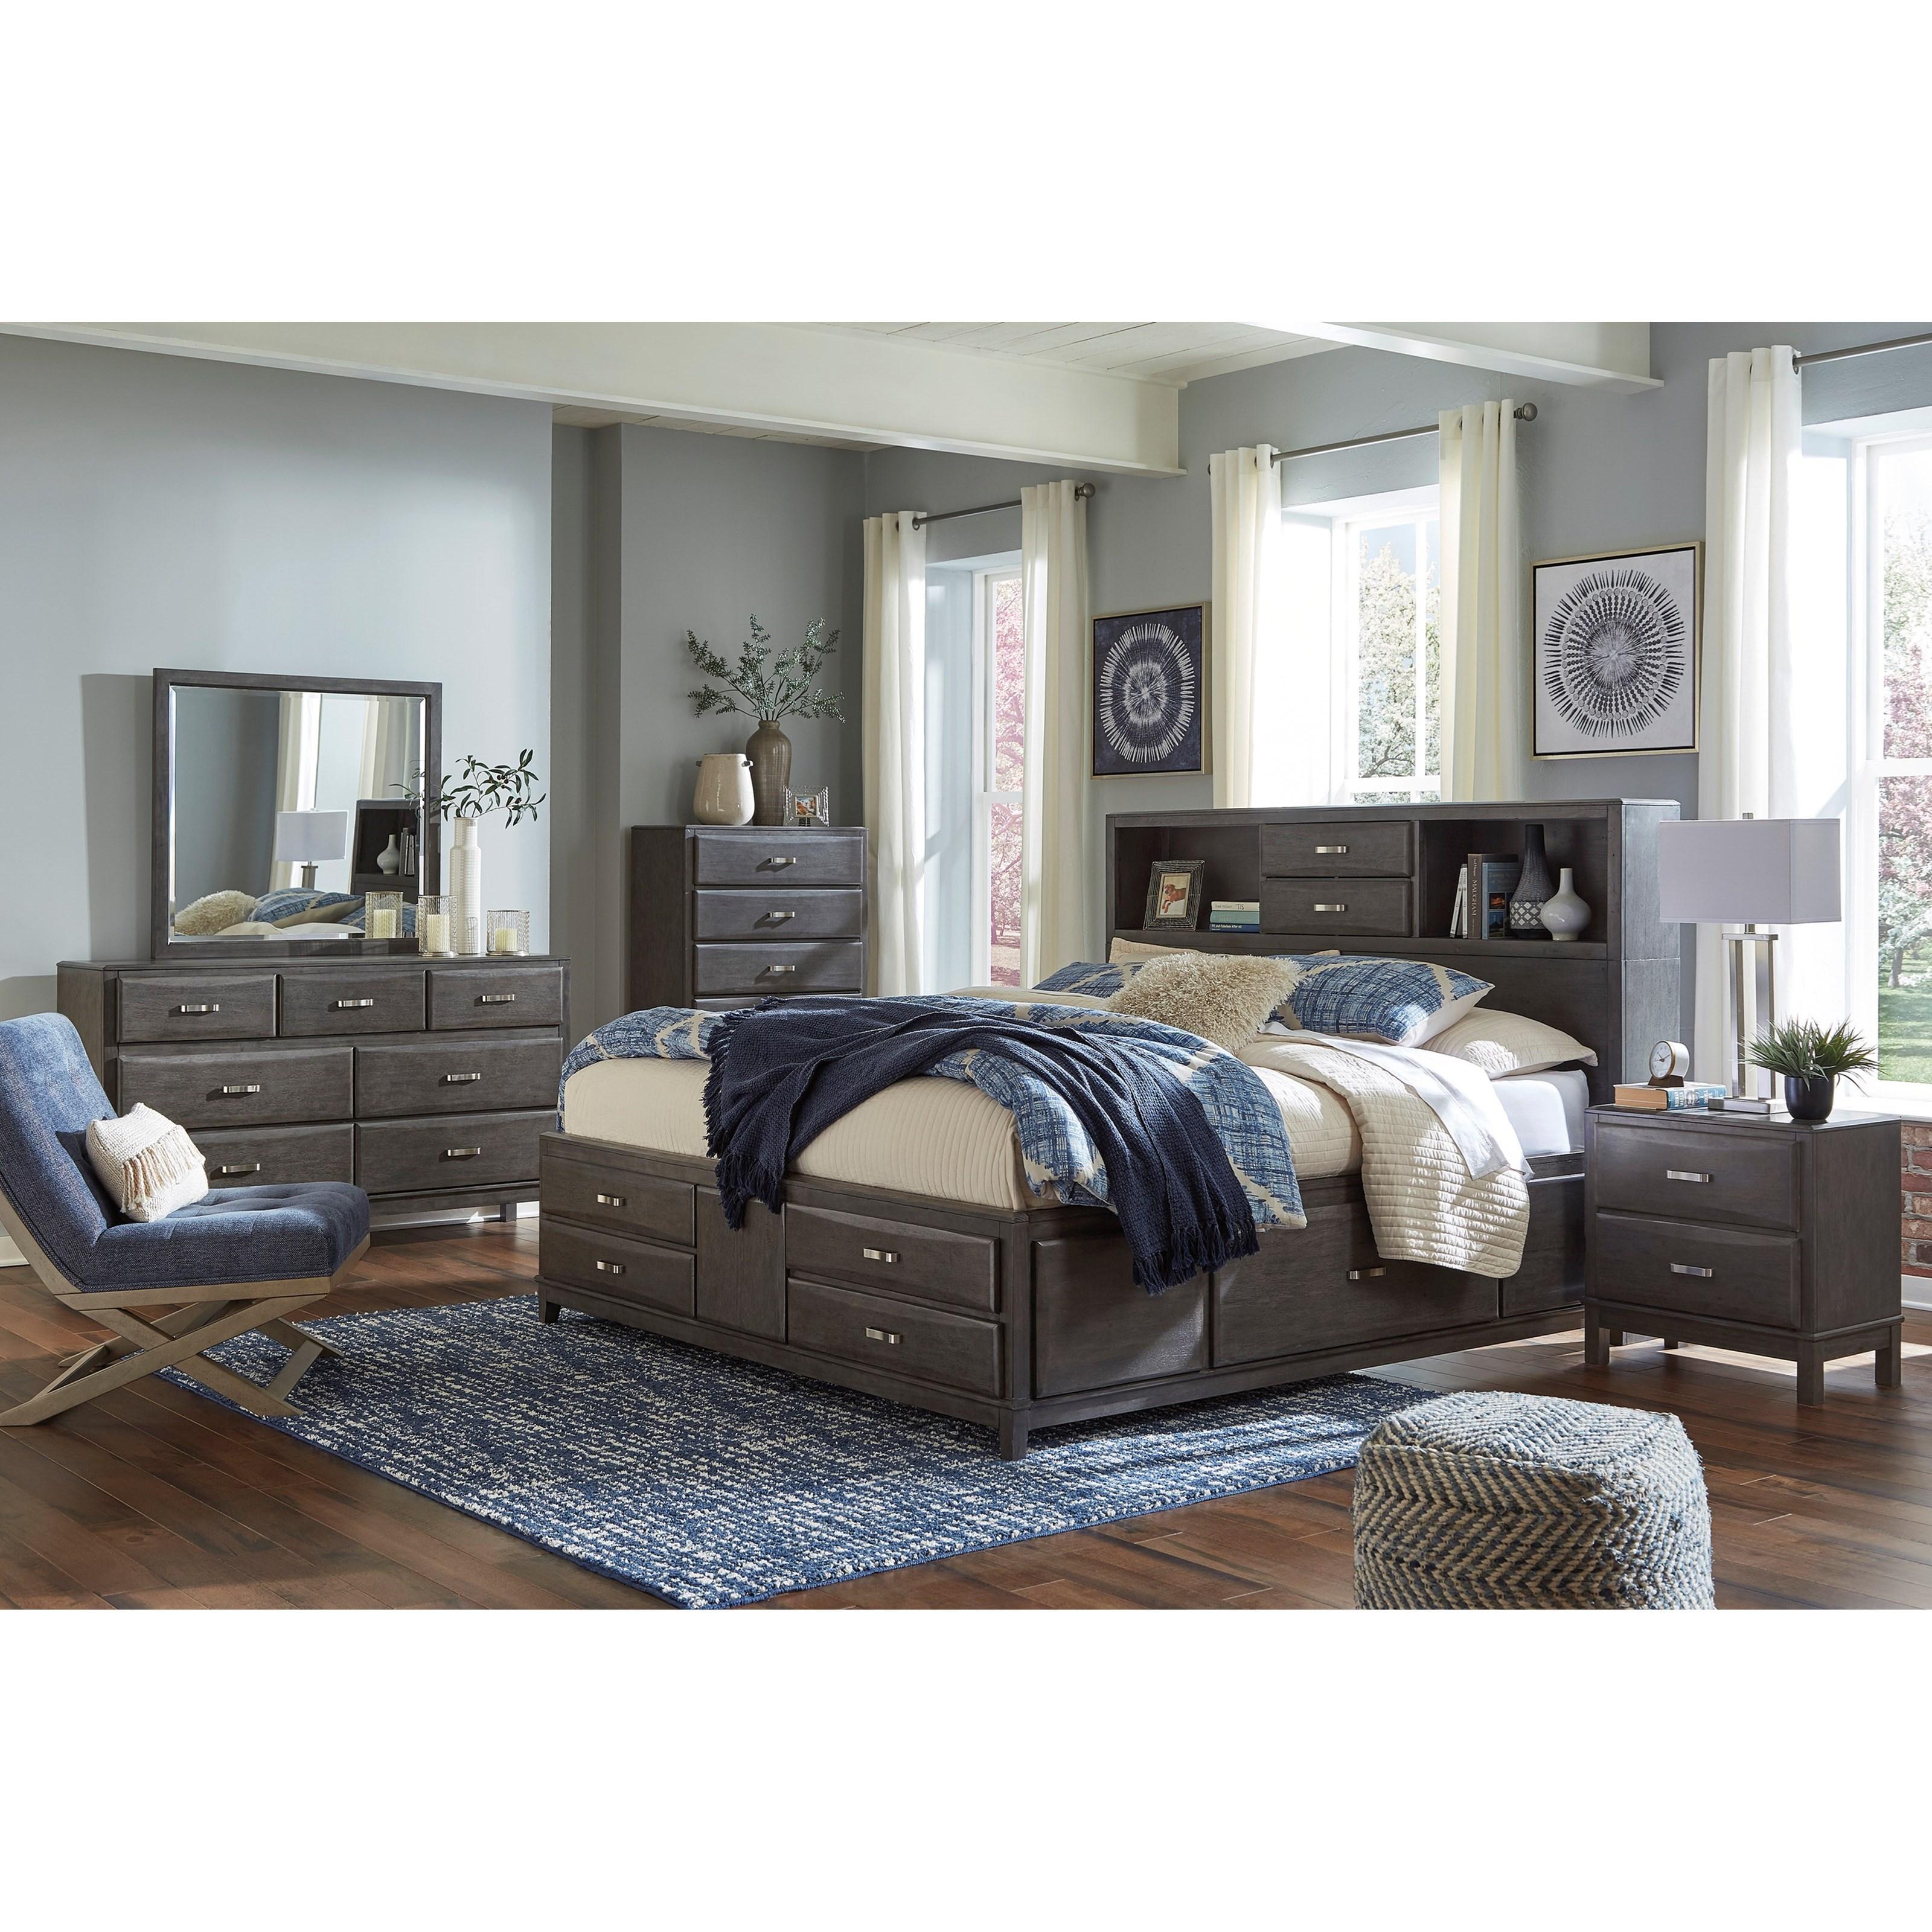 Ashleys Furniture Anchorage: Signature Design Caitbrook Casual 7-Drawer Dresser